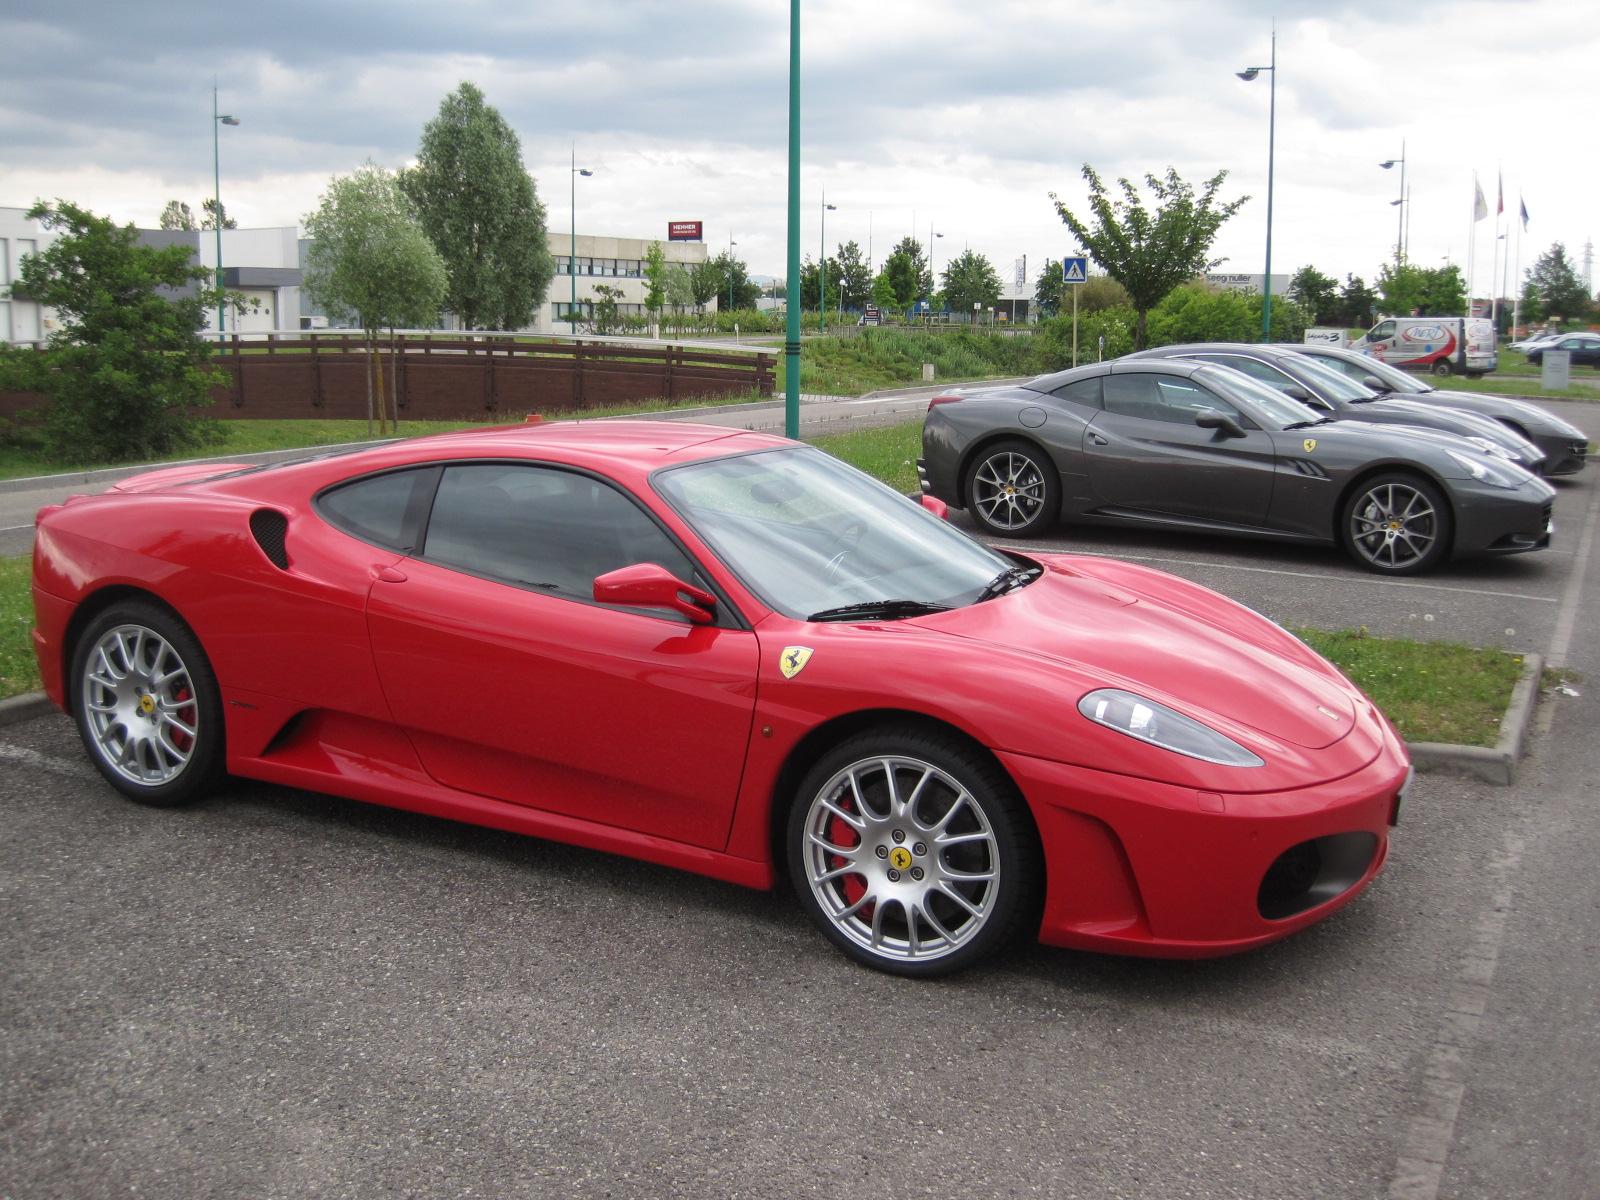 Ferrari F430 0001 World Cars Desktop Background